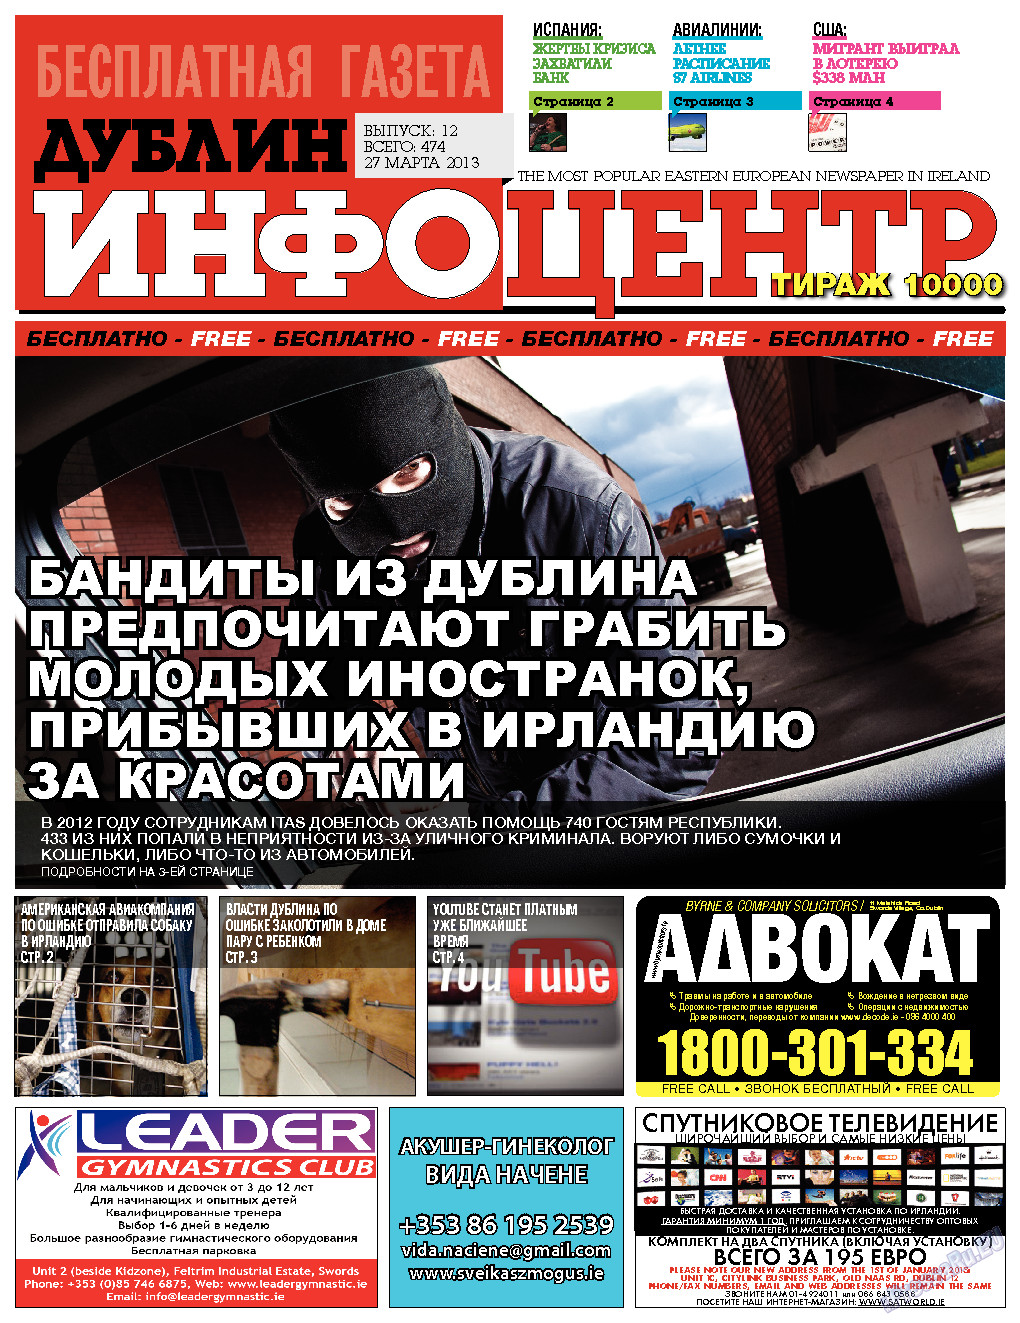 Дублин инфоцентр (газета). 2013 год, номер 12, стр. 1